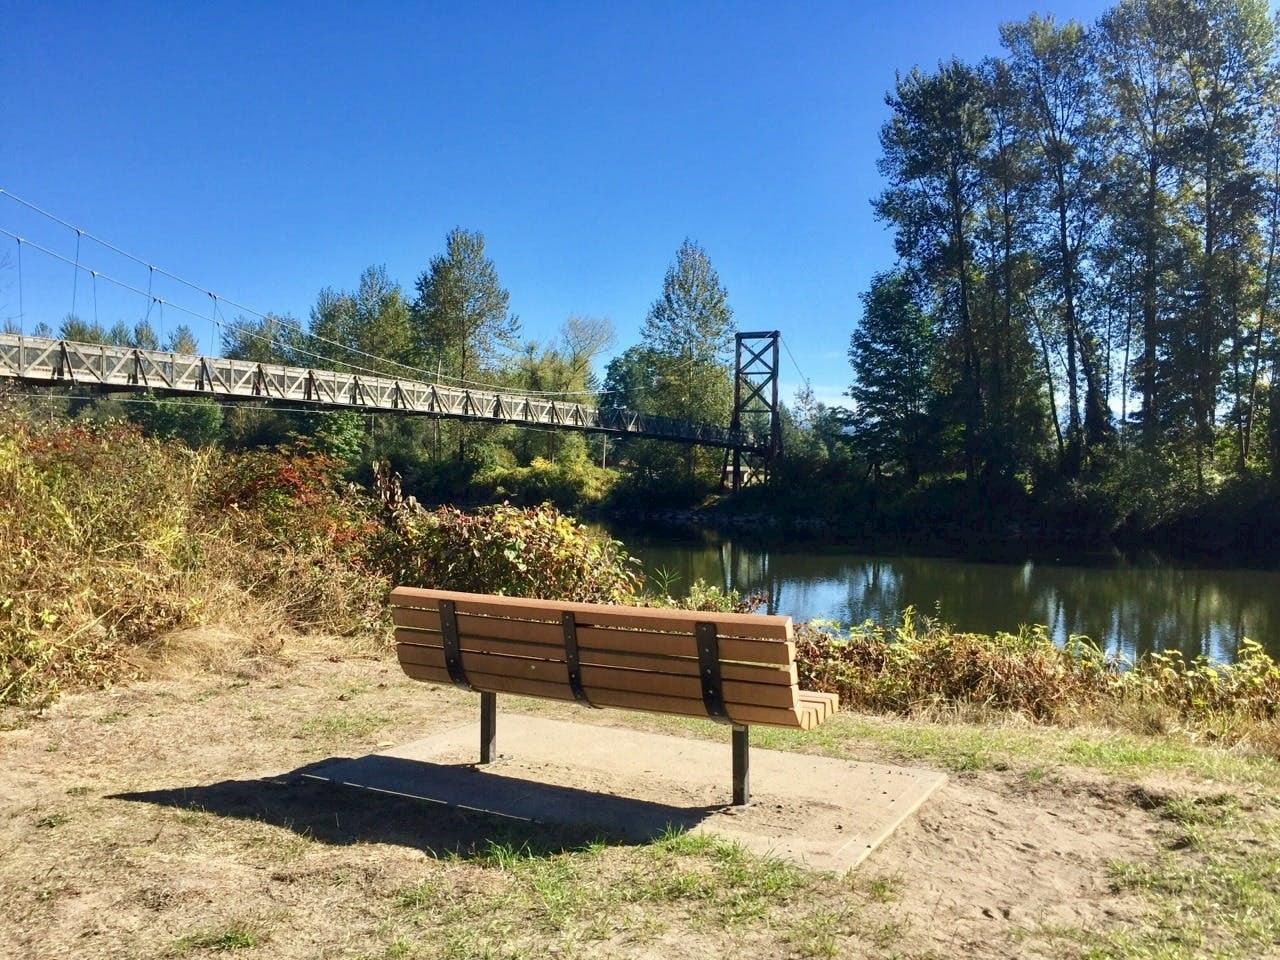 park bench looking at bridge